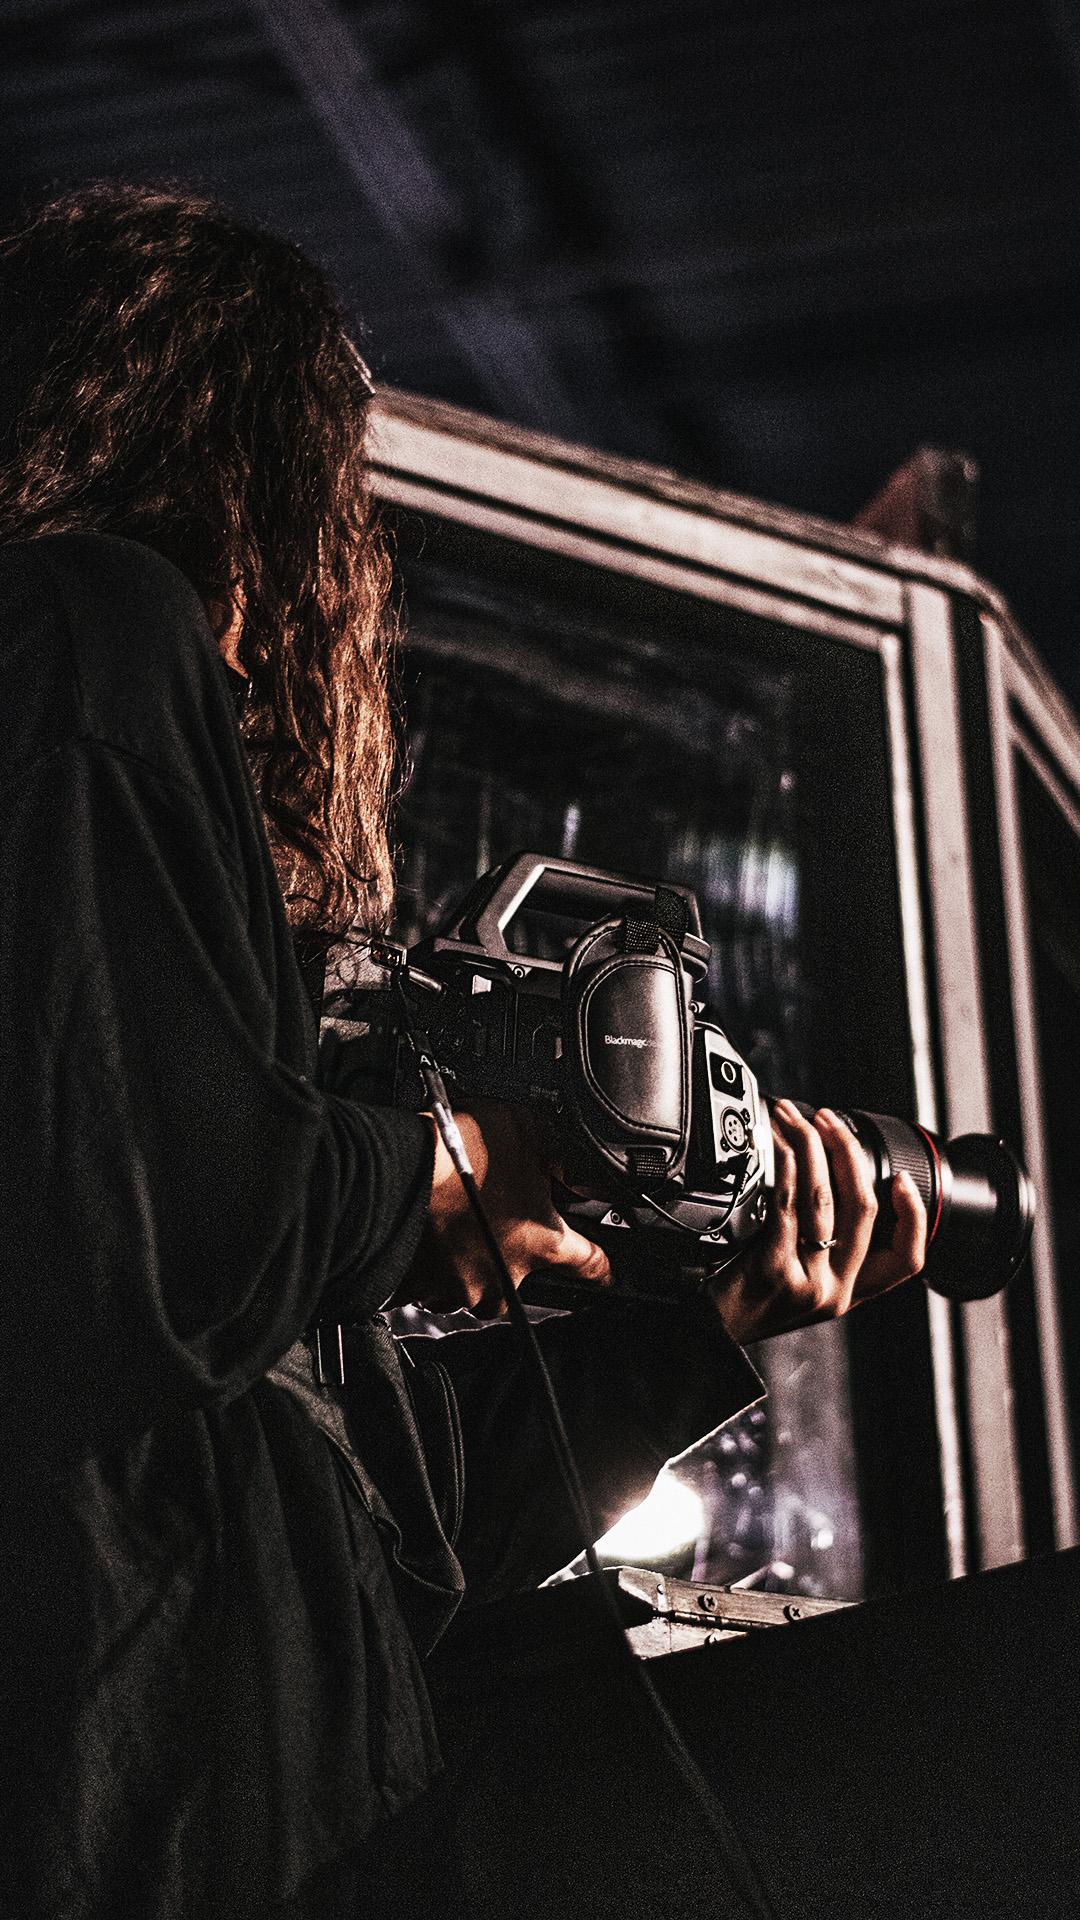 HOB_camera